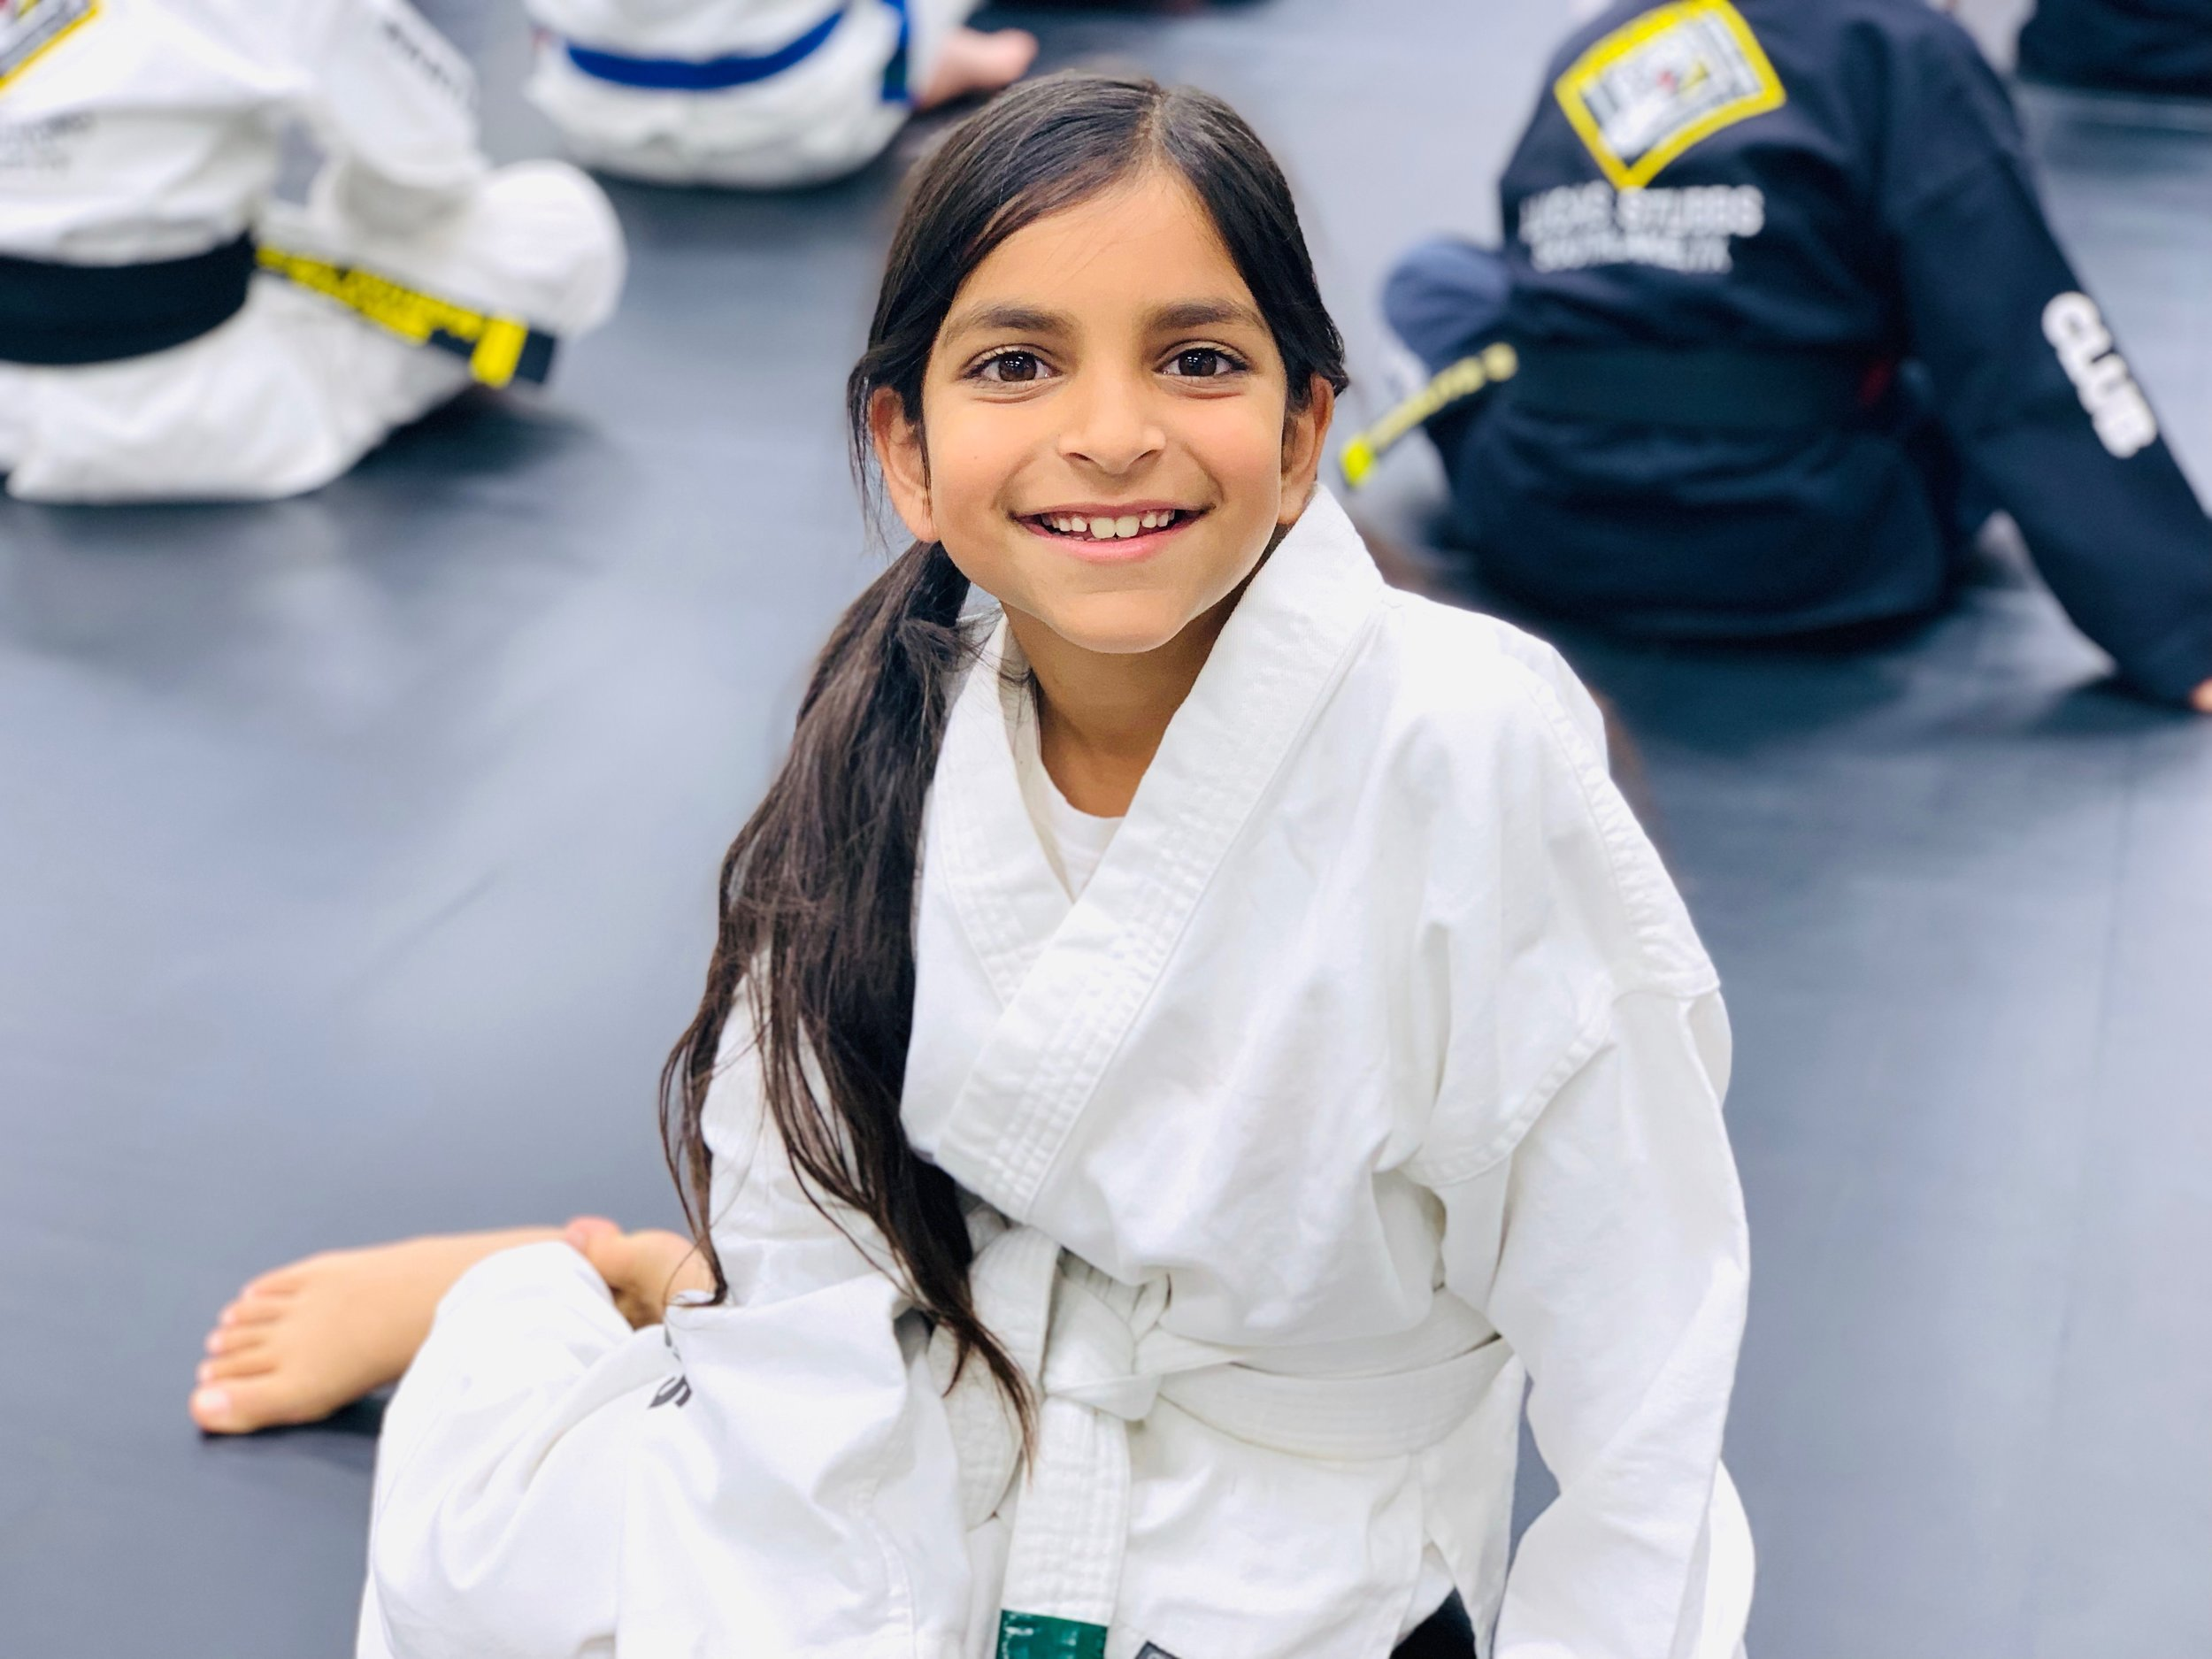 southlake-texas-karate-for-children.jpeg